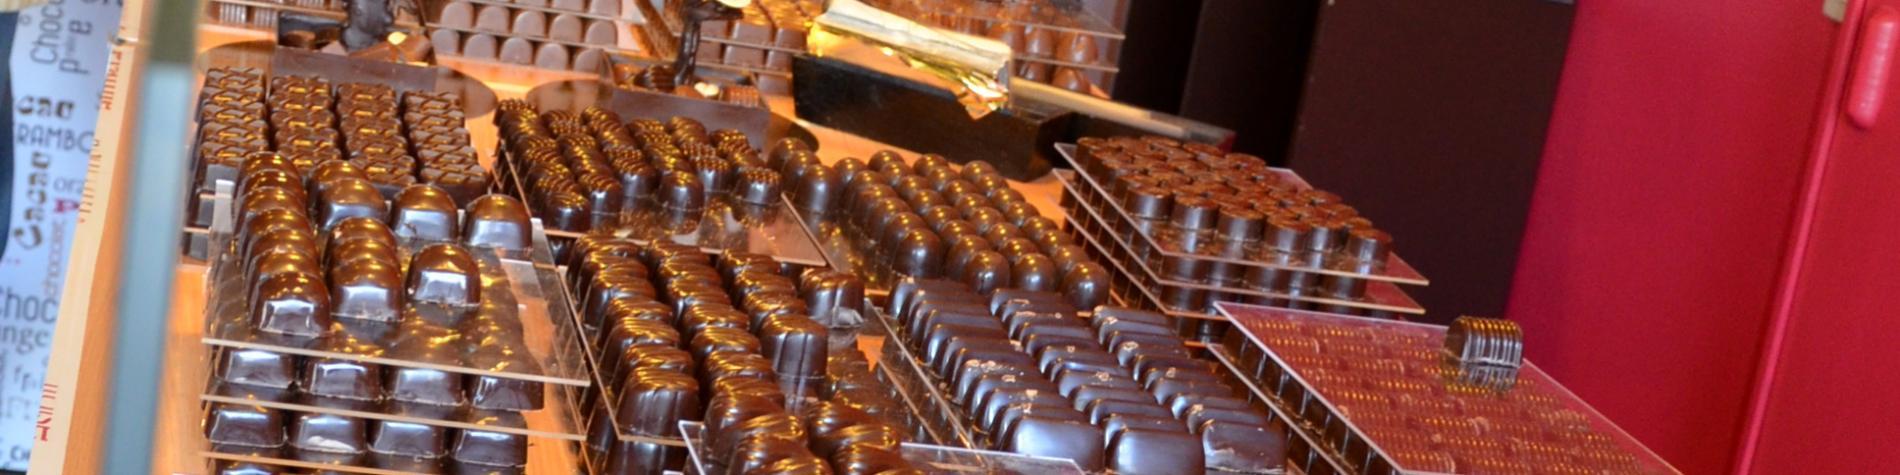 Jean le chocolatier